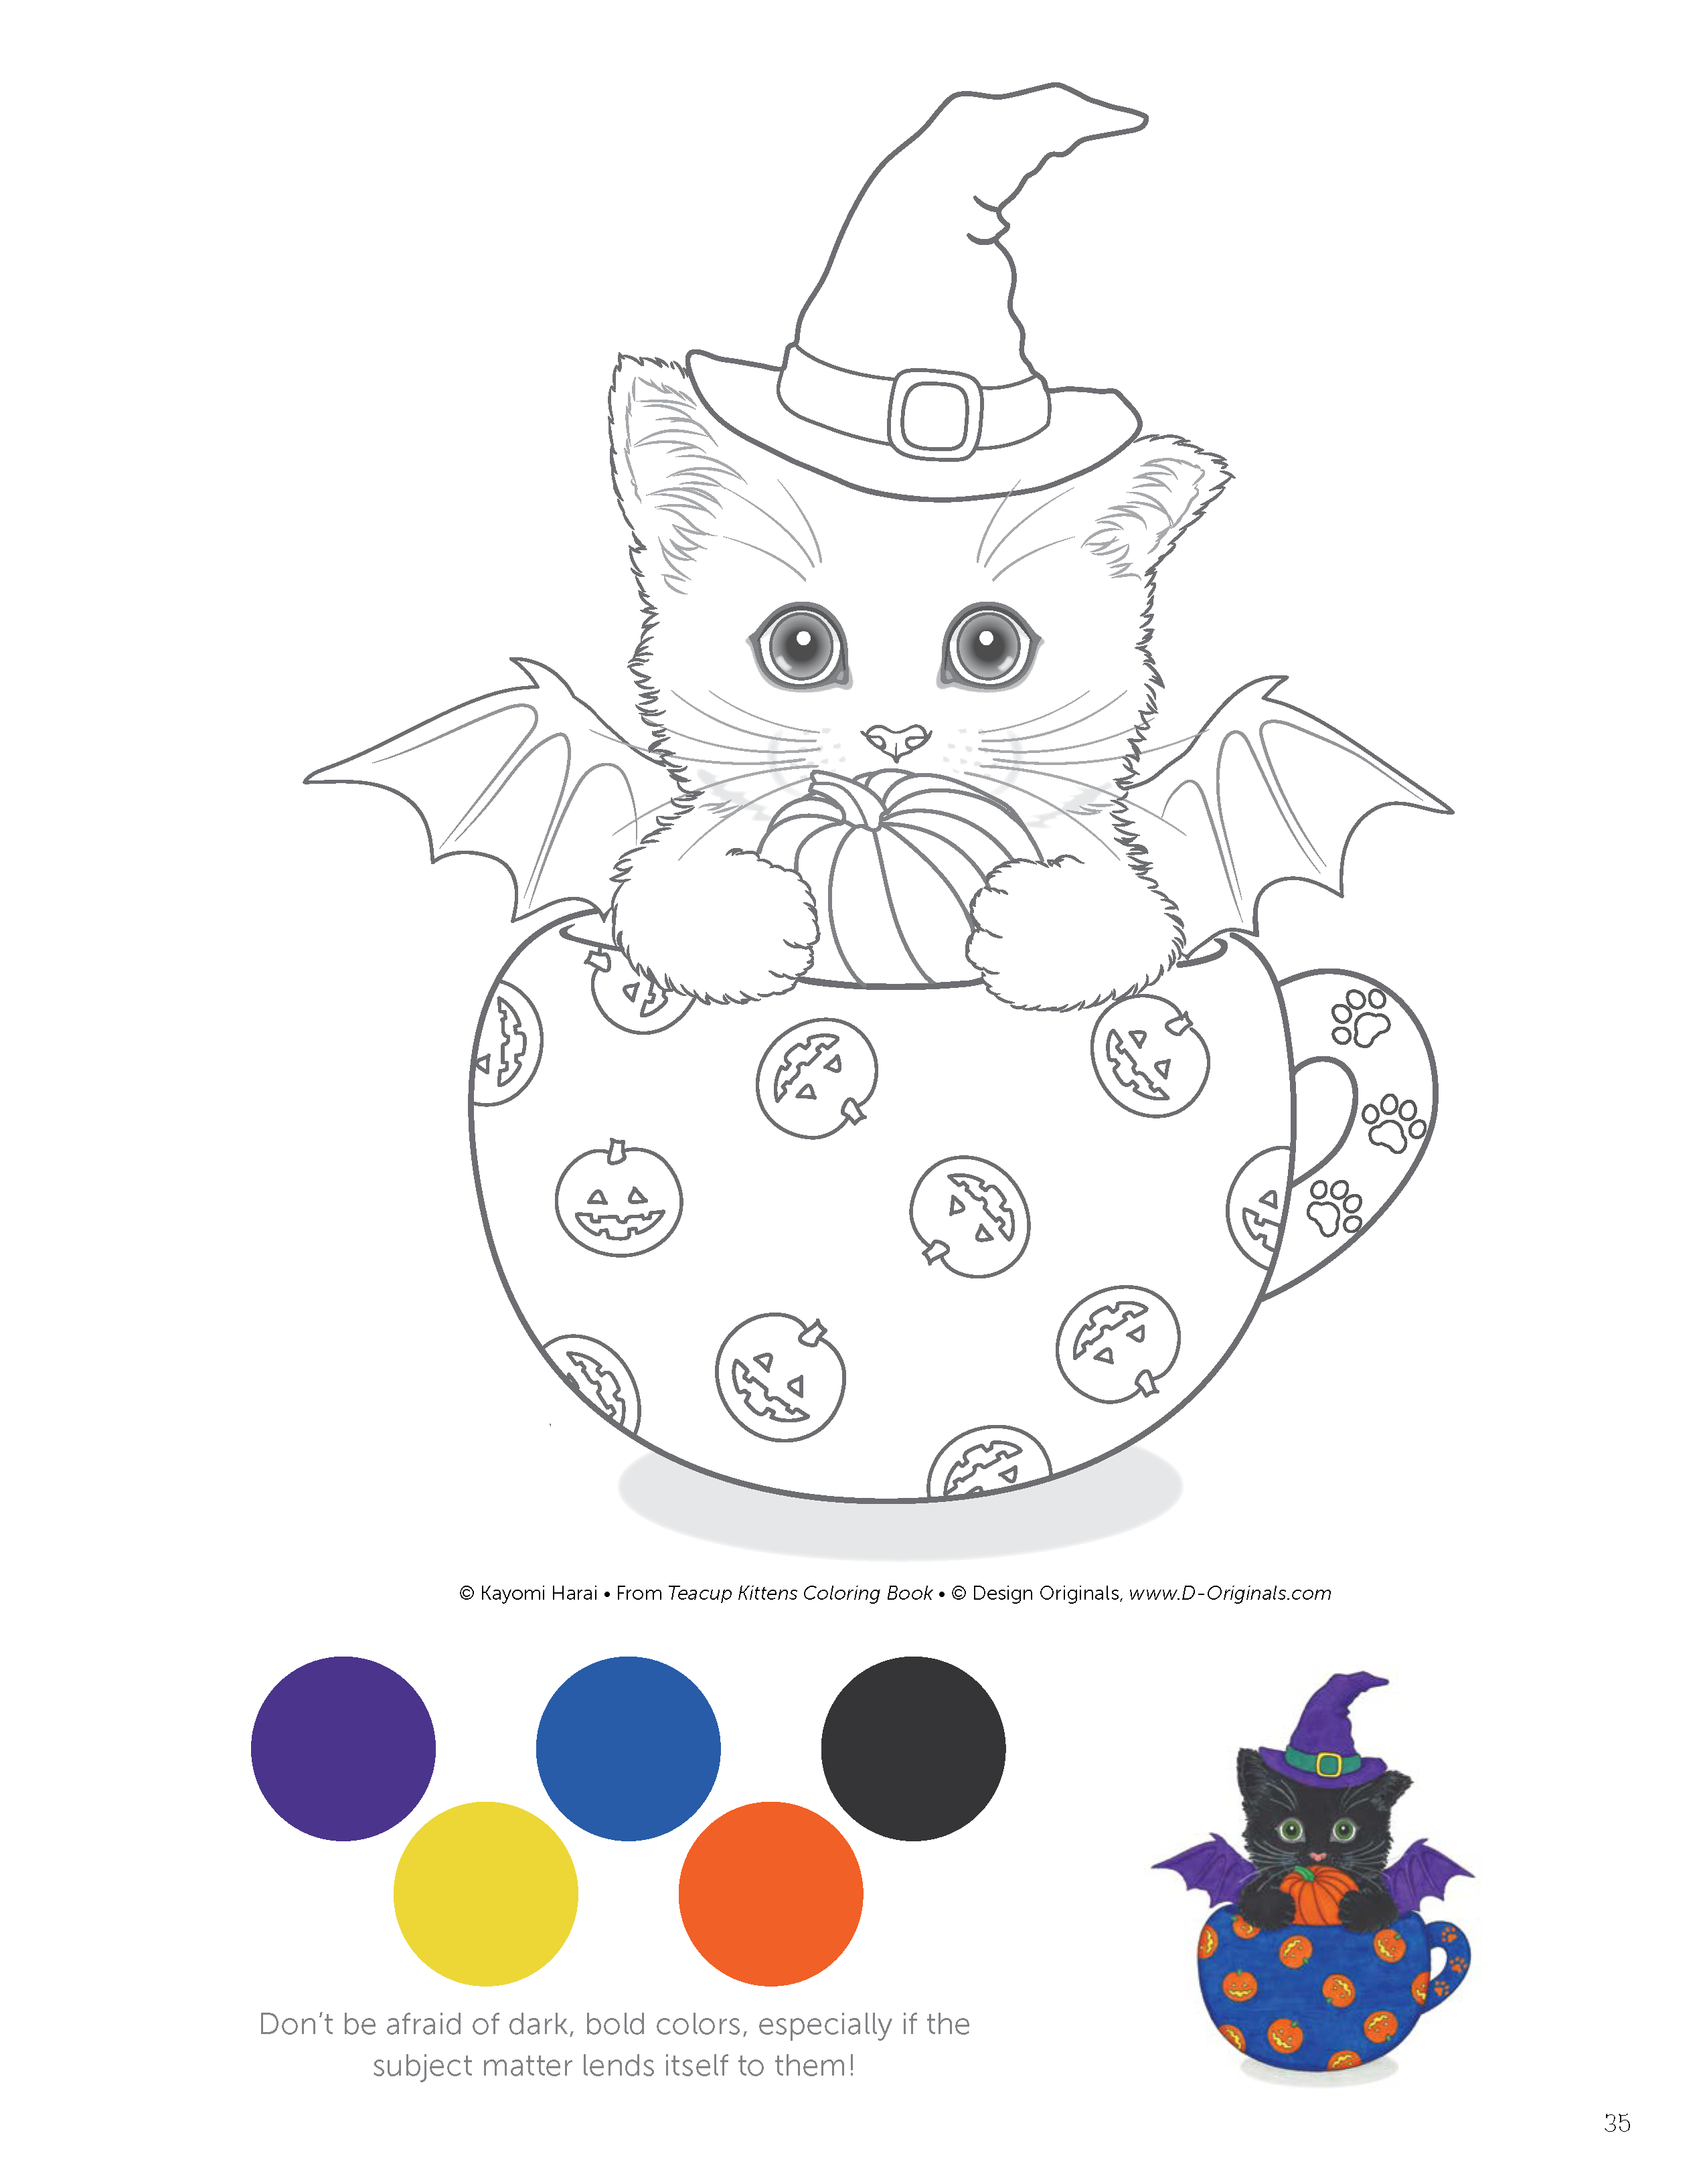 - Amazon.com: Teacup Kittens Coloring Book (Design Originals) 32